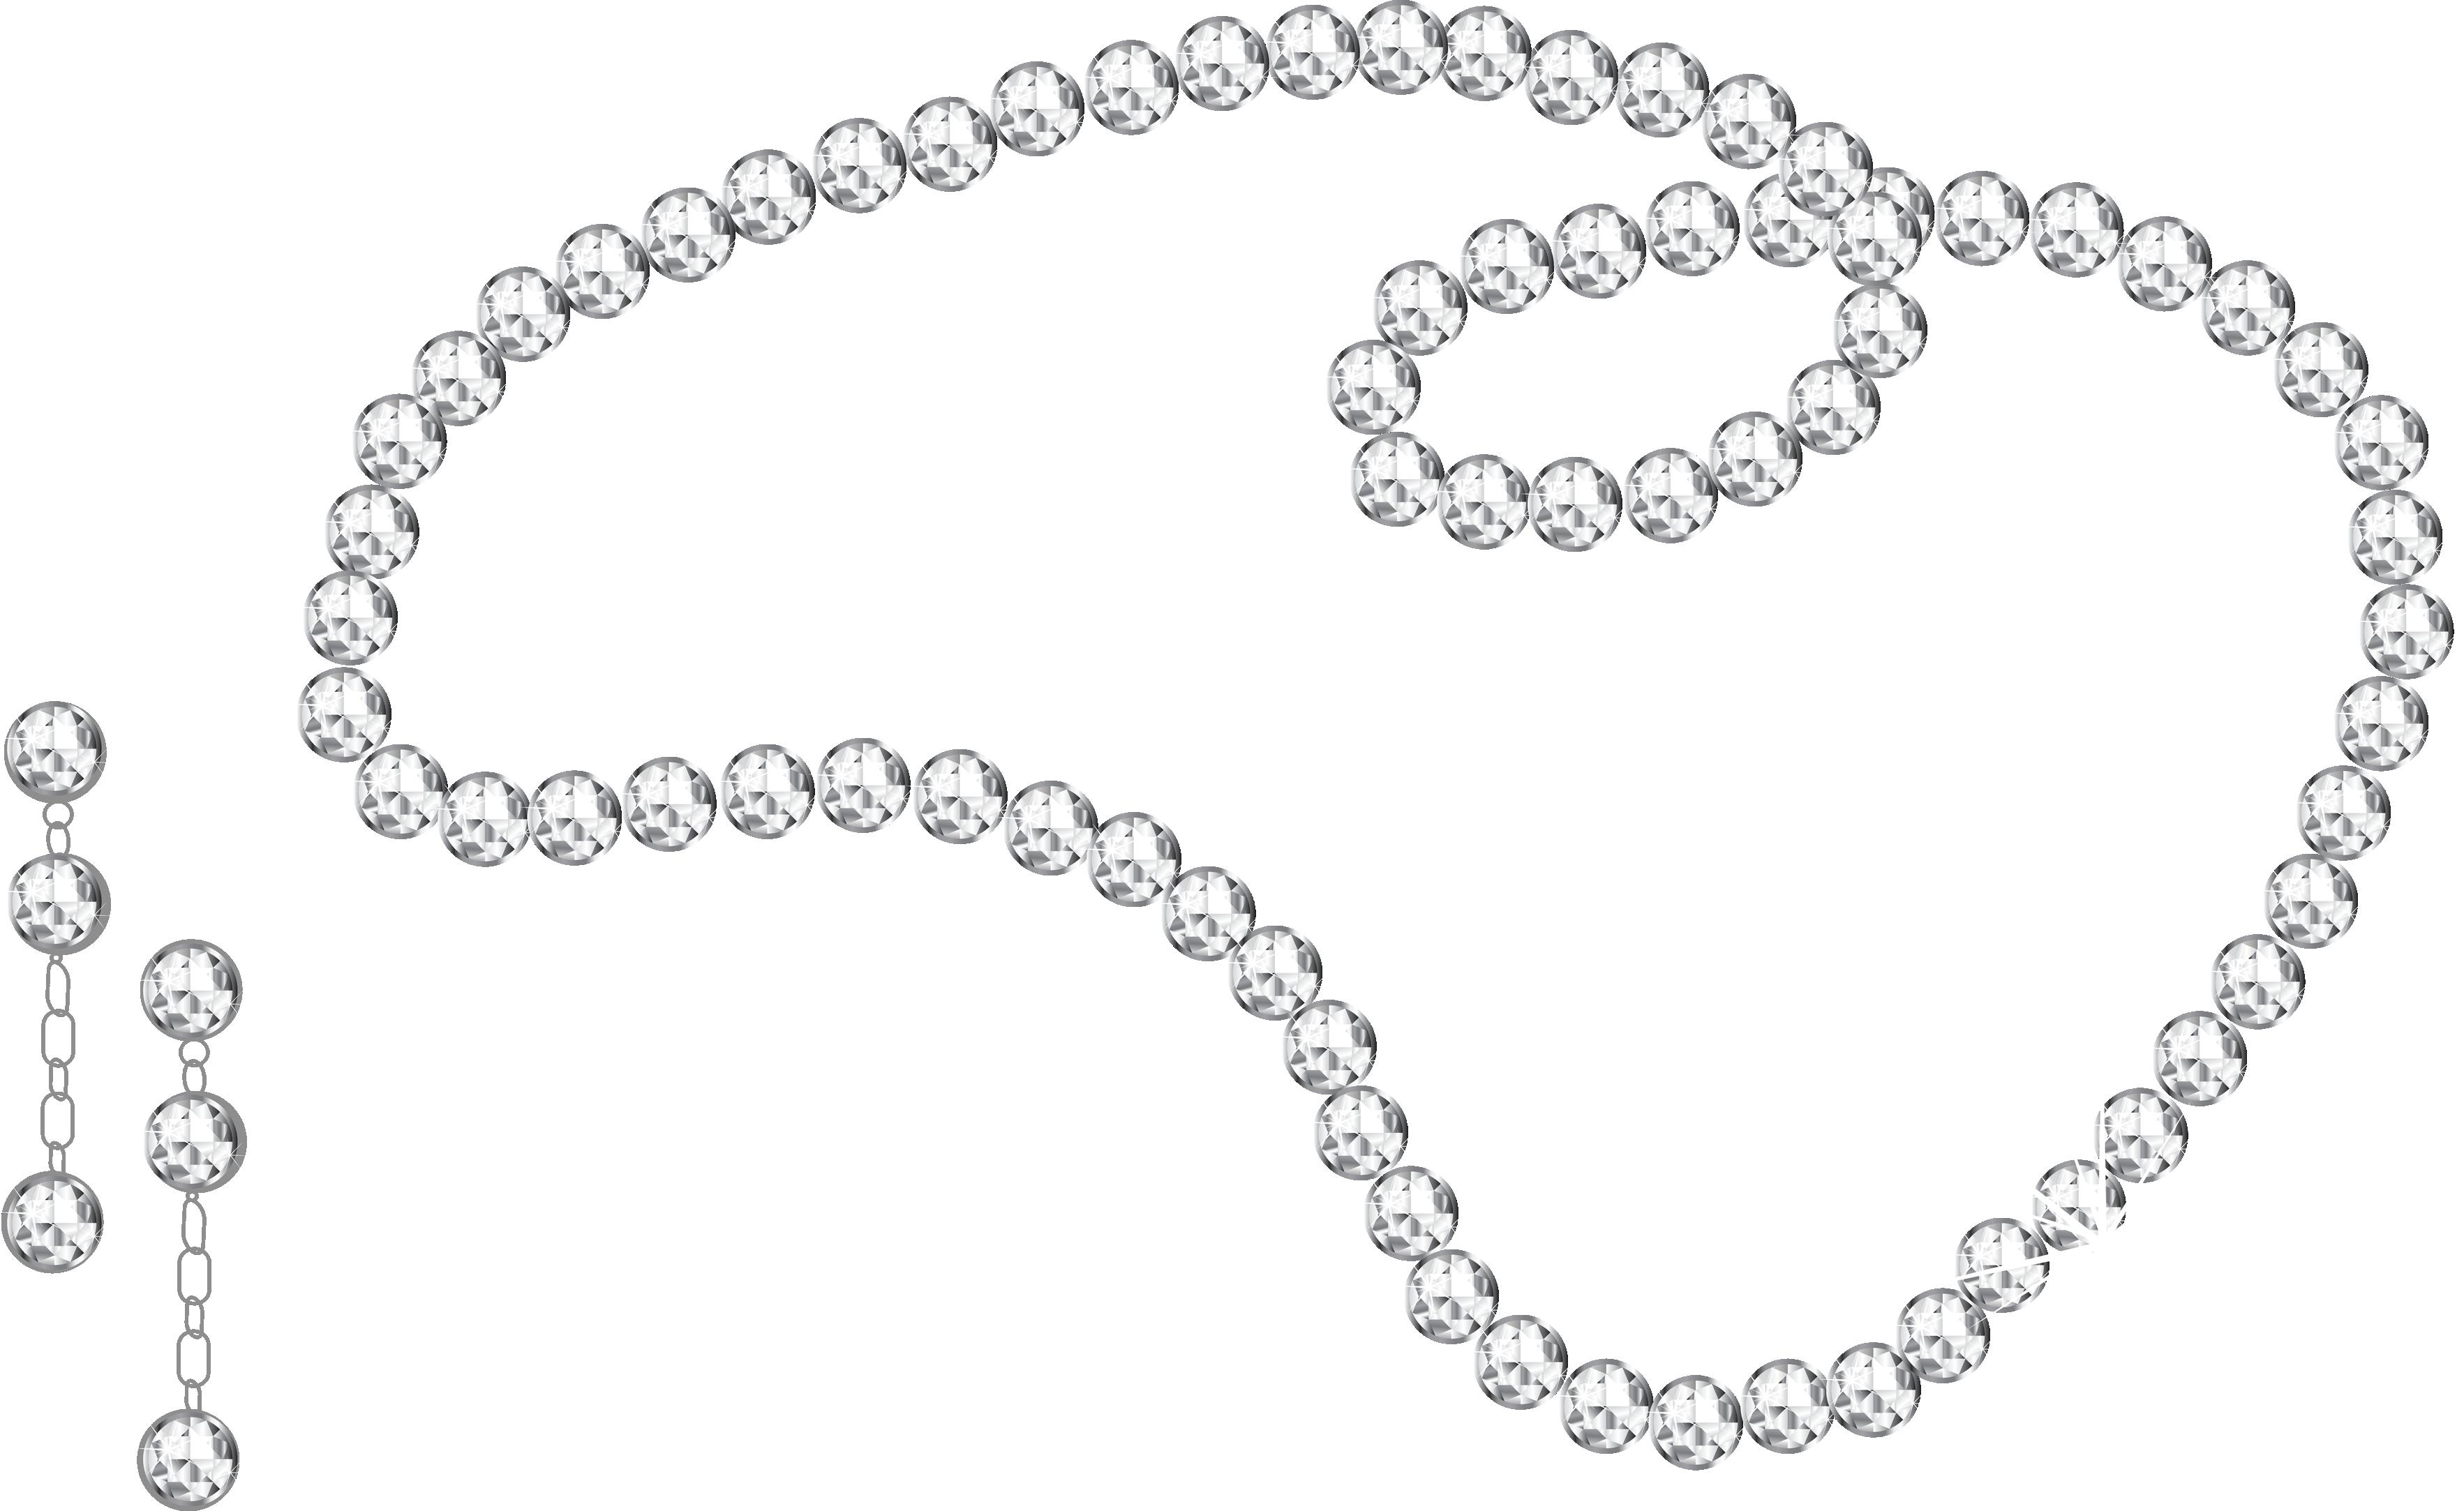 Ornament clipart jewellery model, Ornament jewellery model.